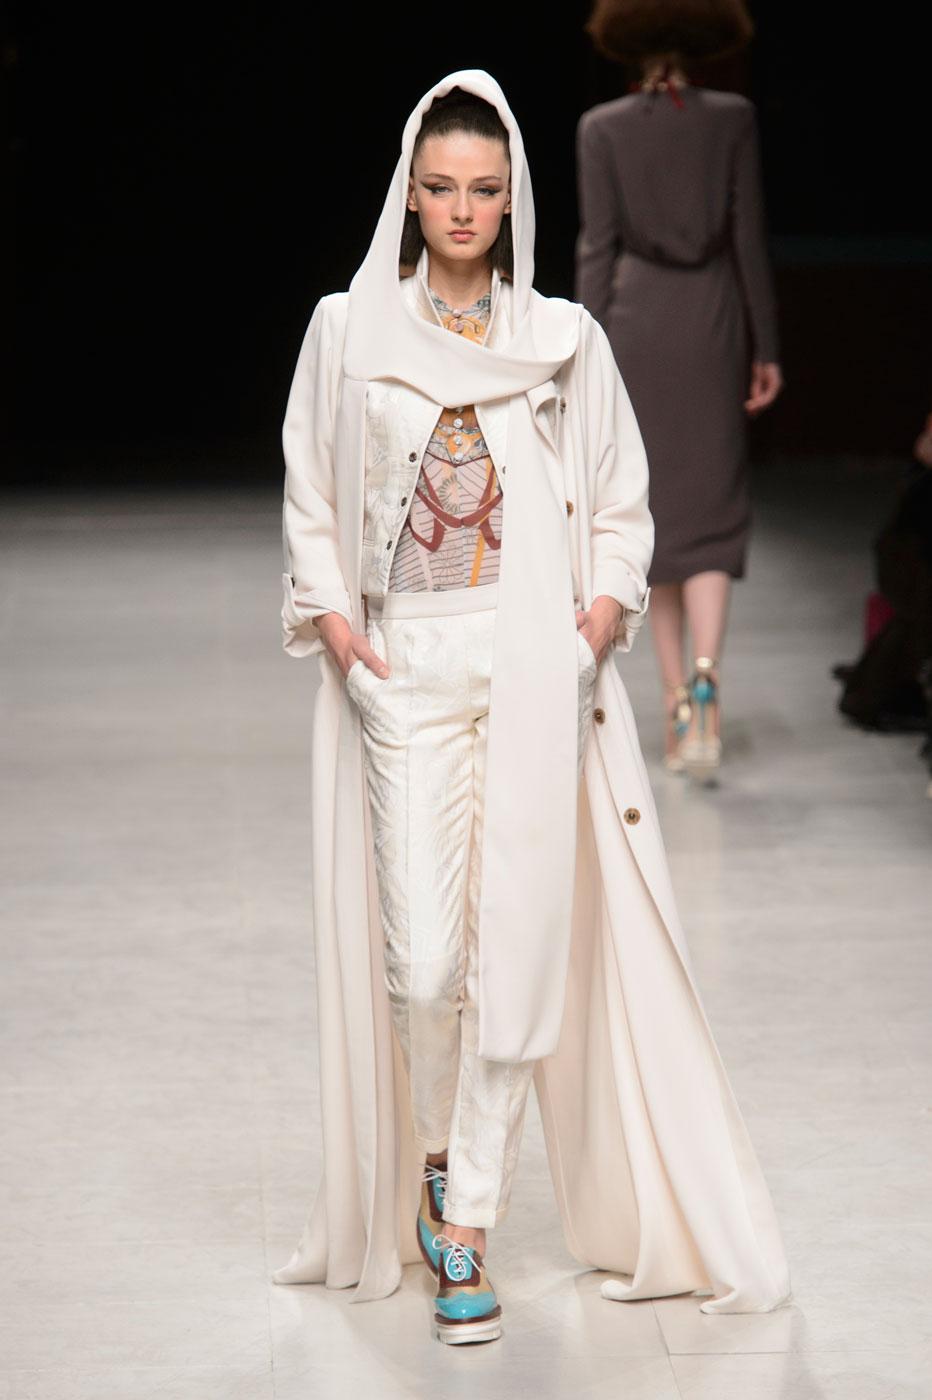 Julien-Fournie-Prive-fashion-runway-show-haute-couture-paris-spring-2015-the-impression-20